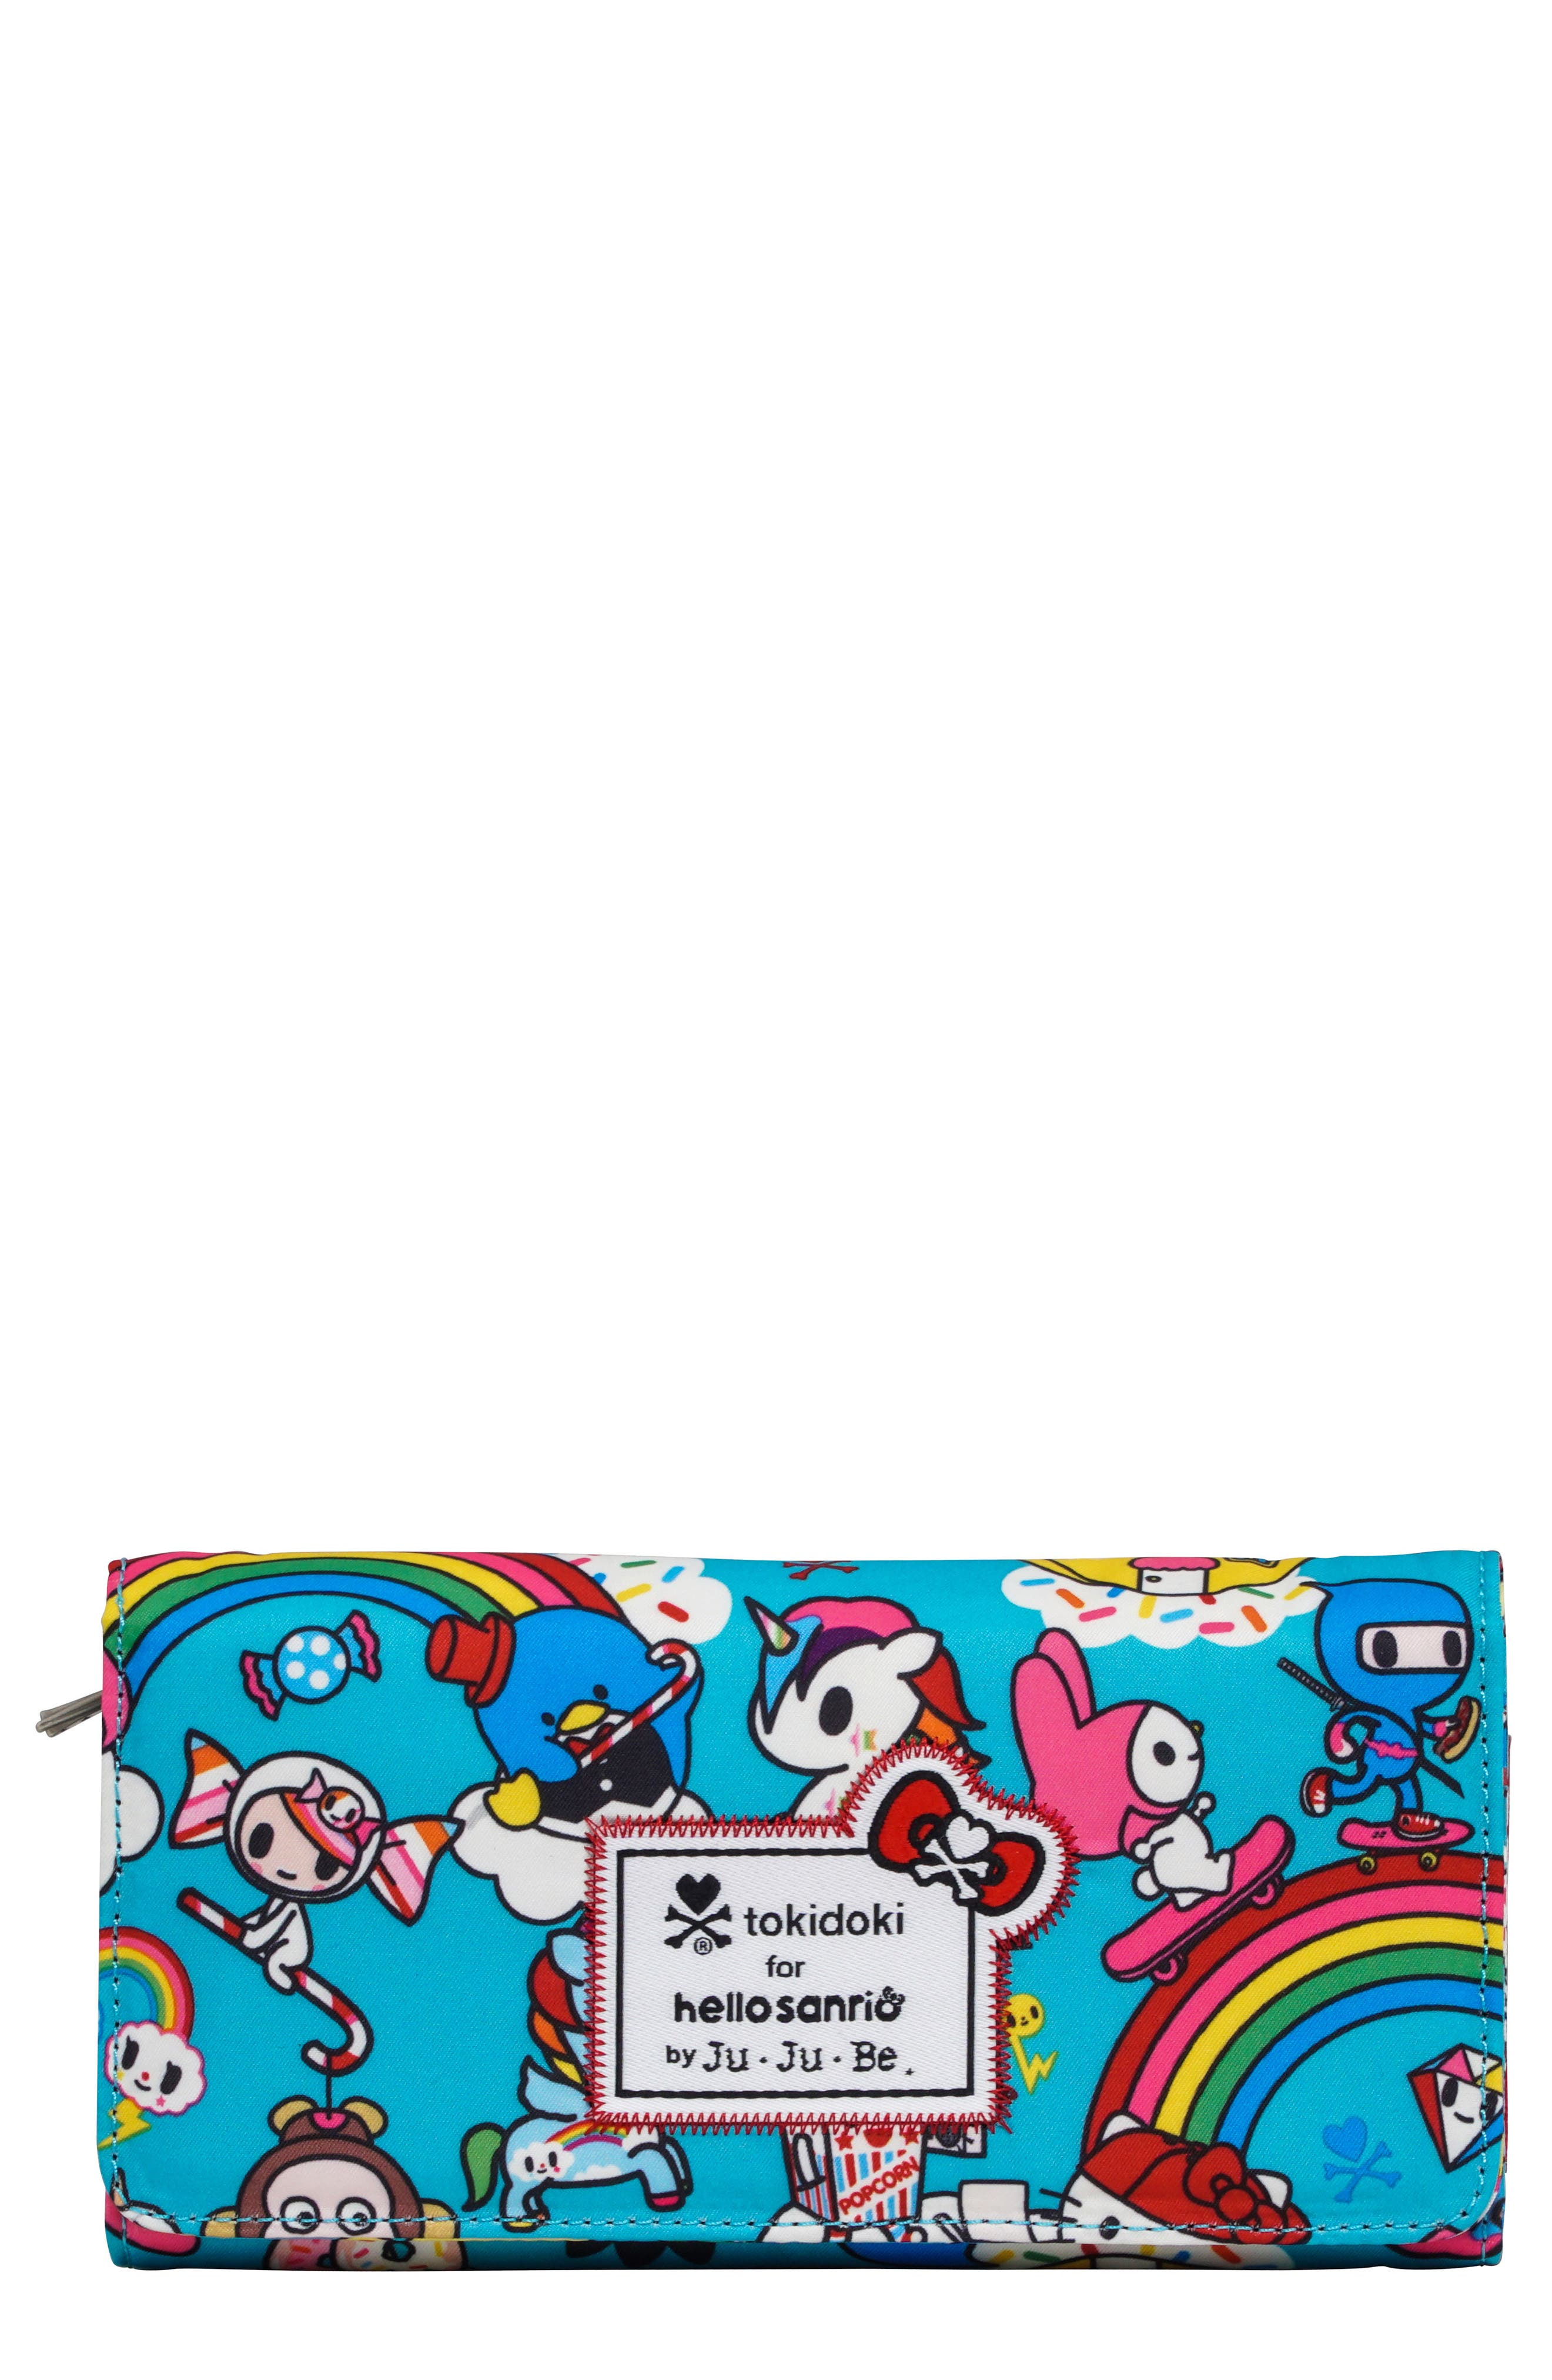 x tokidoki for Hello Sanrio Rainbow Dreams Be Rich Trifold Clutch Wallet,                         Main,                         color, RAINBOW DREAMS